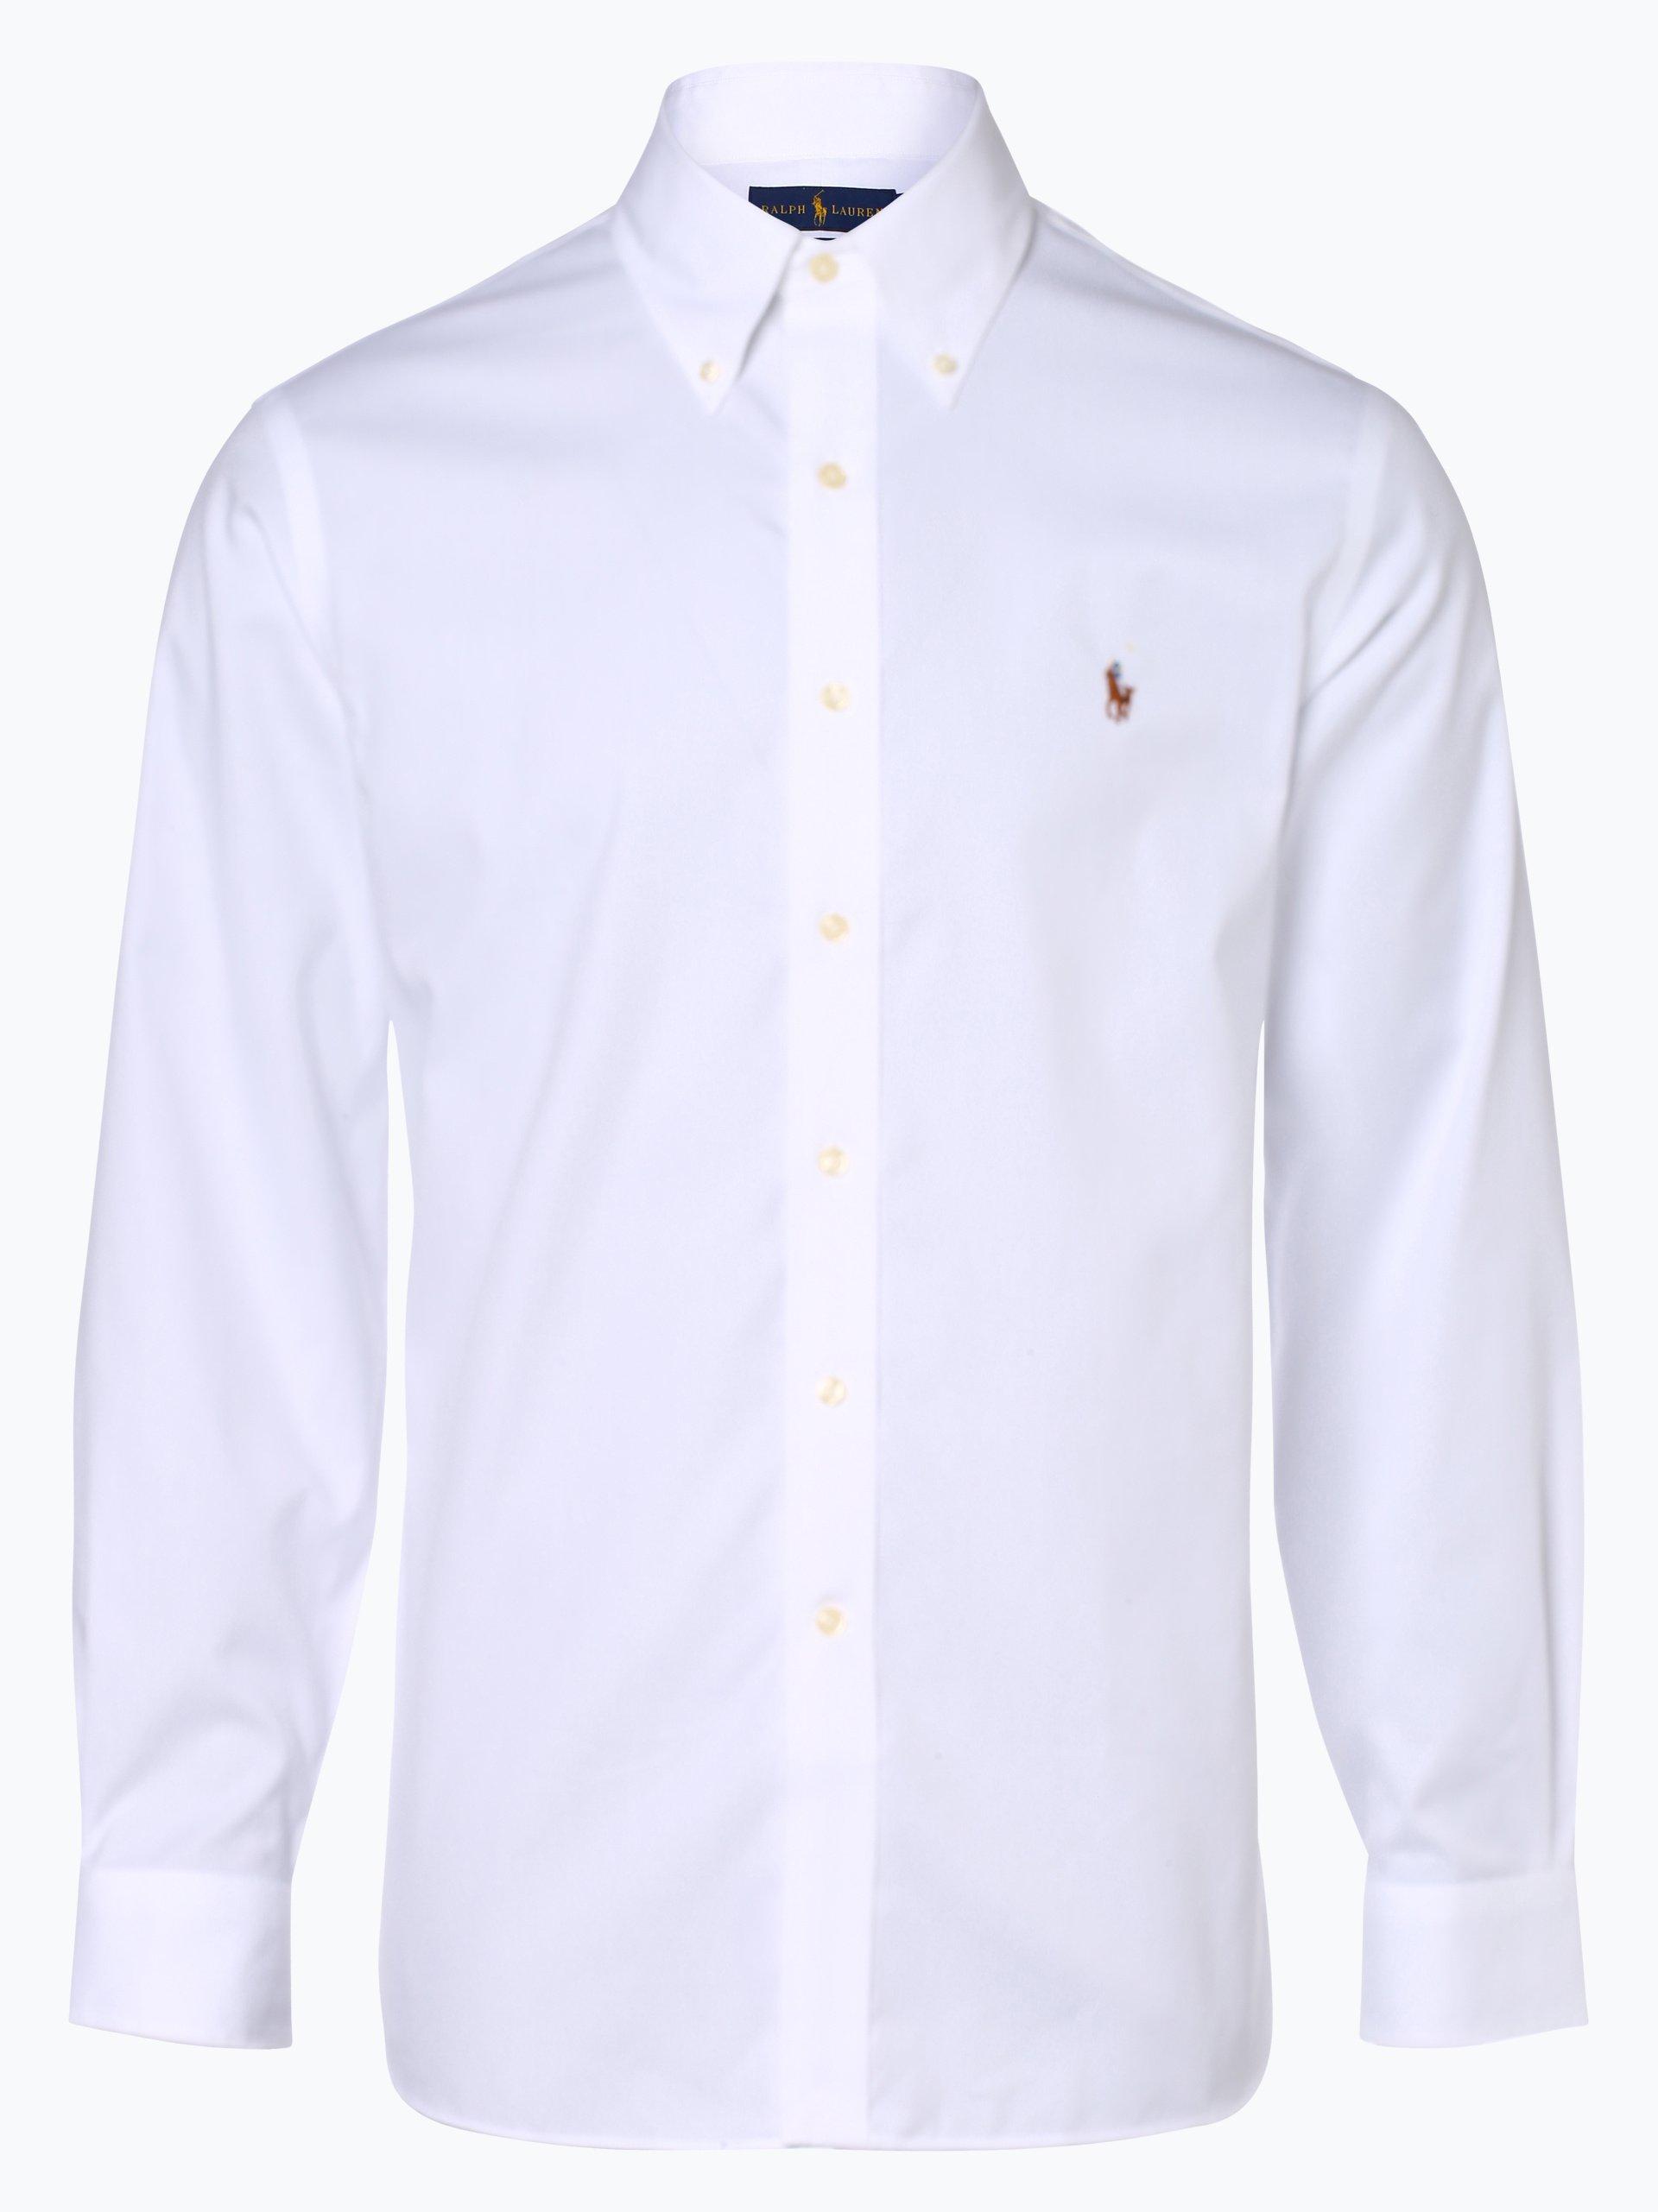 Polo Ralph Lauren Koszula męska łatwa w prasowaniu